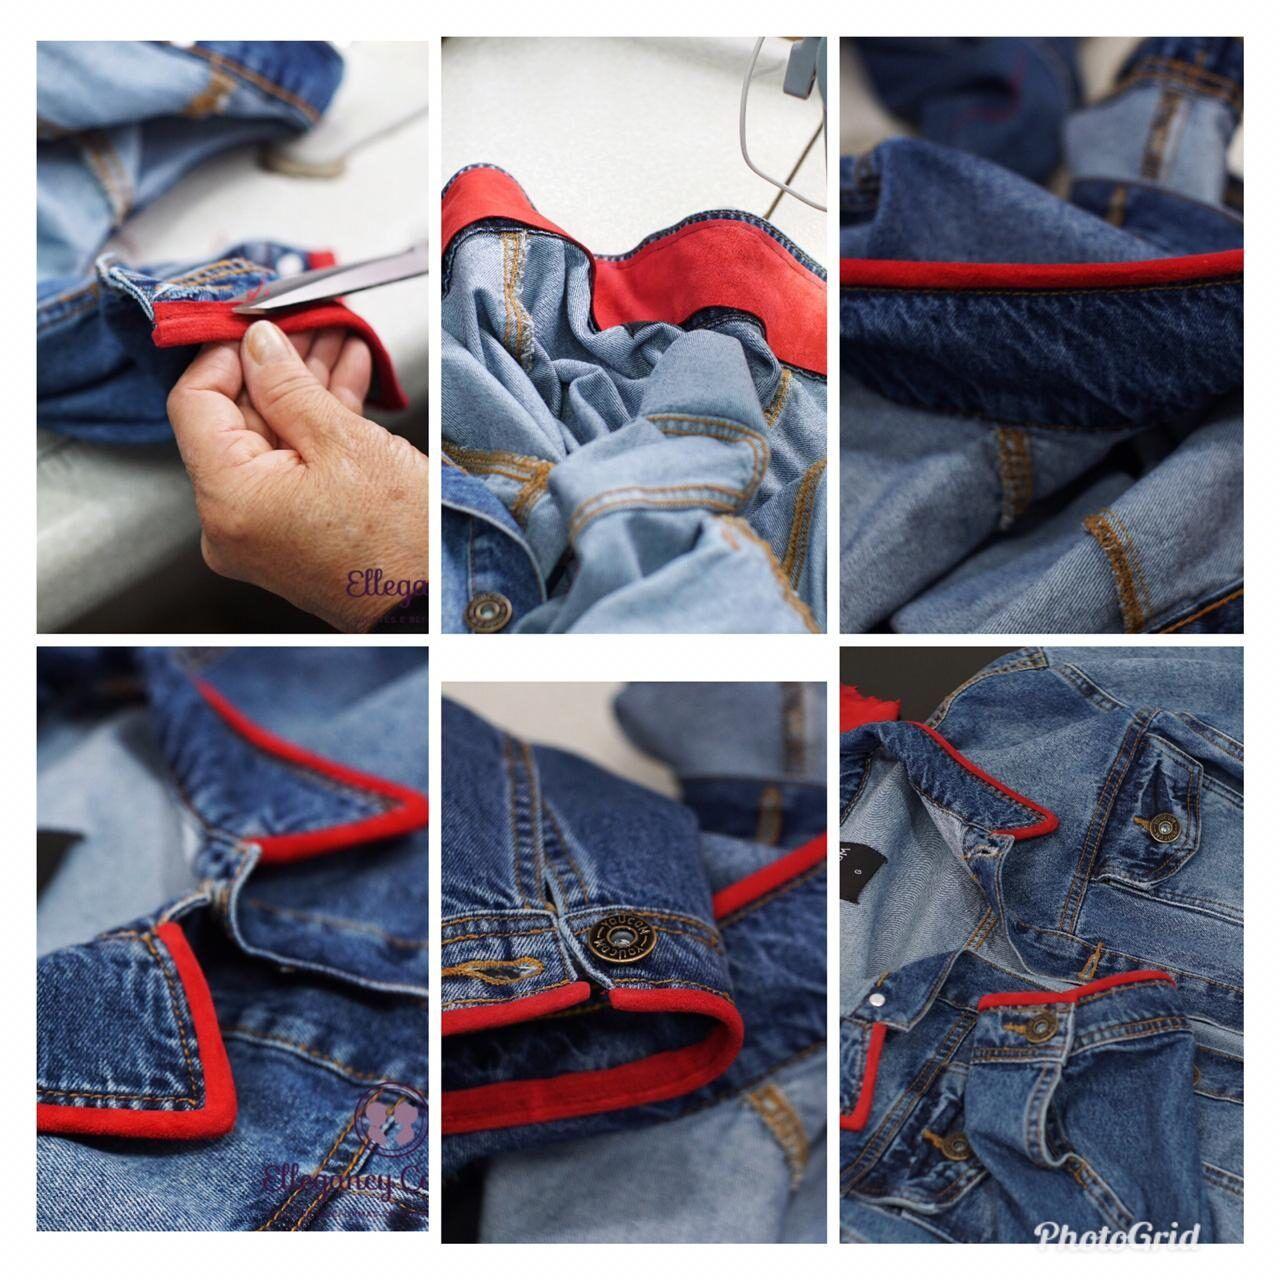 jaqueta-jeans-com-couro-customizar-jaqueta-jeans-6641784